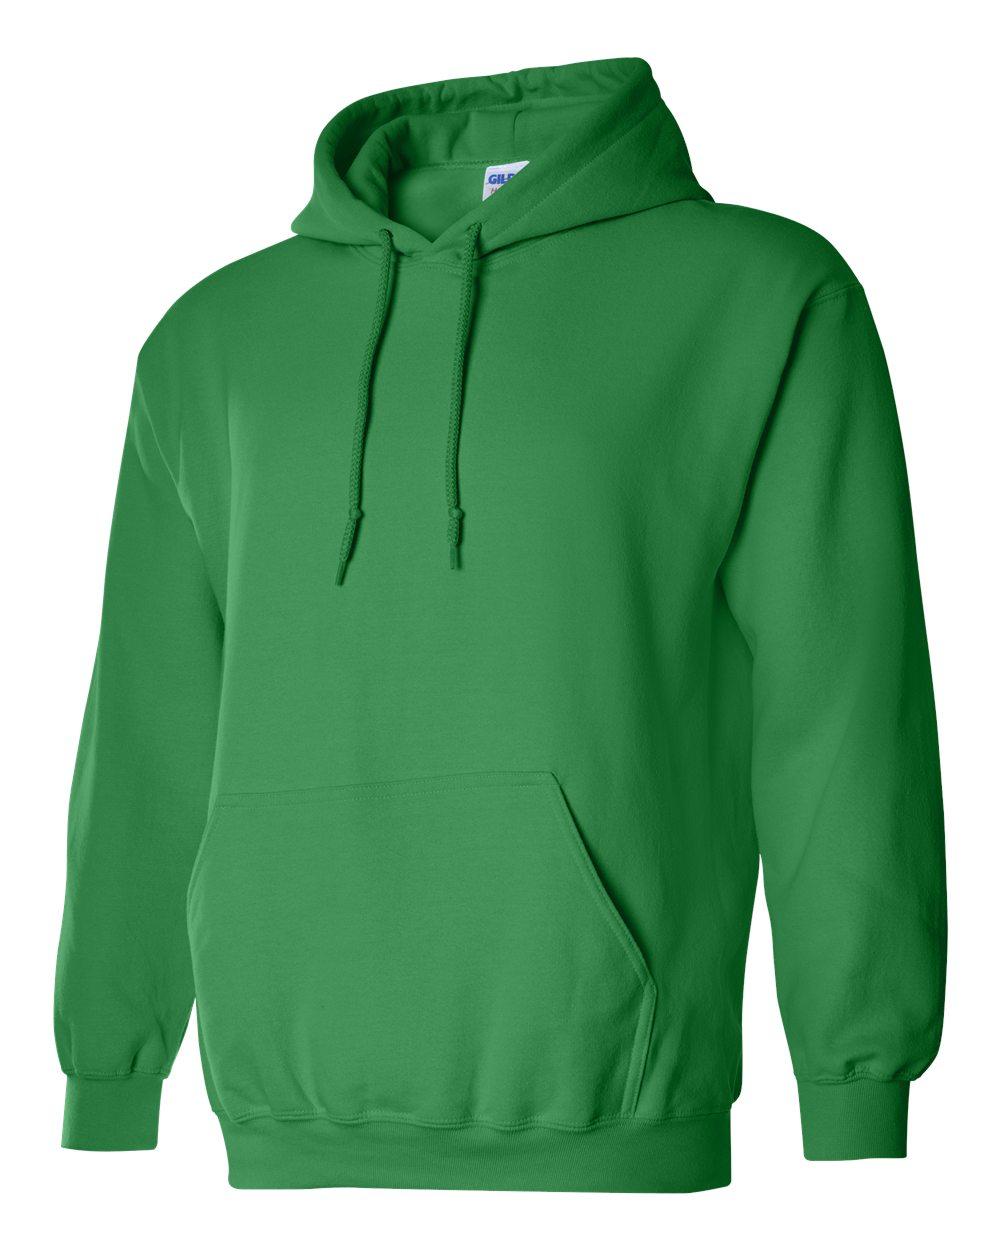 GI18500 Irish Green